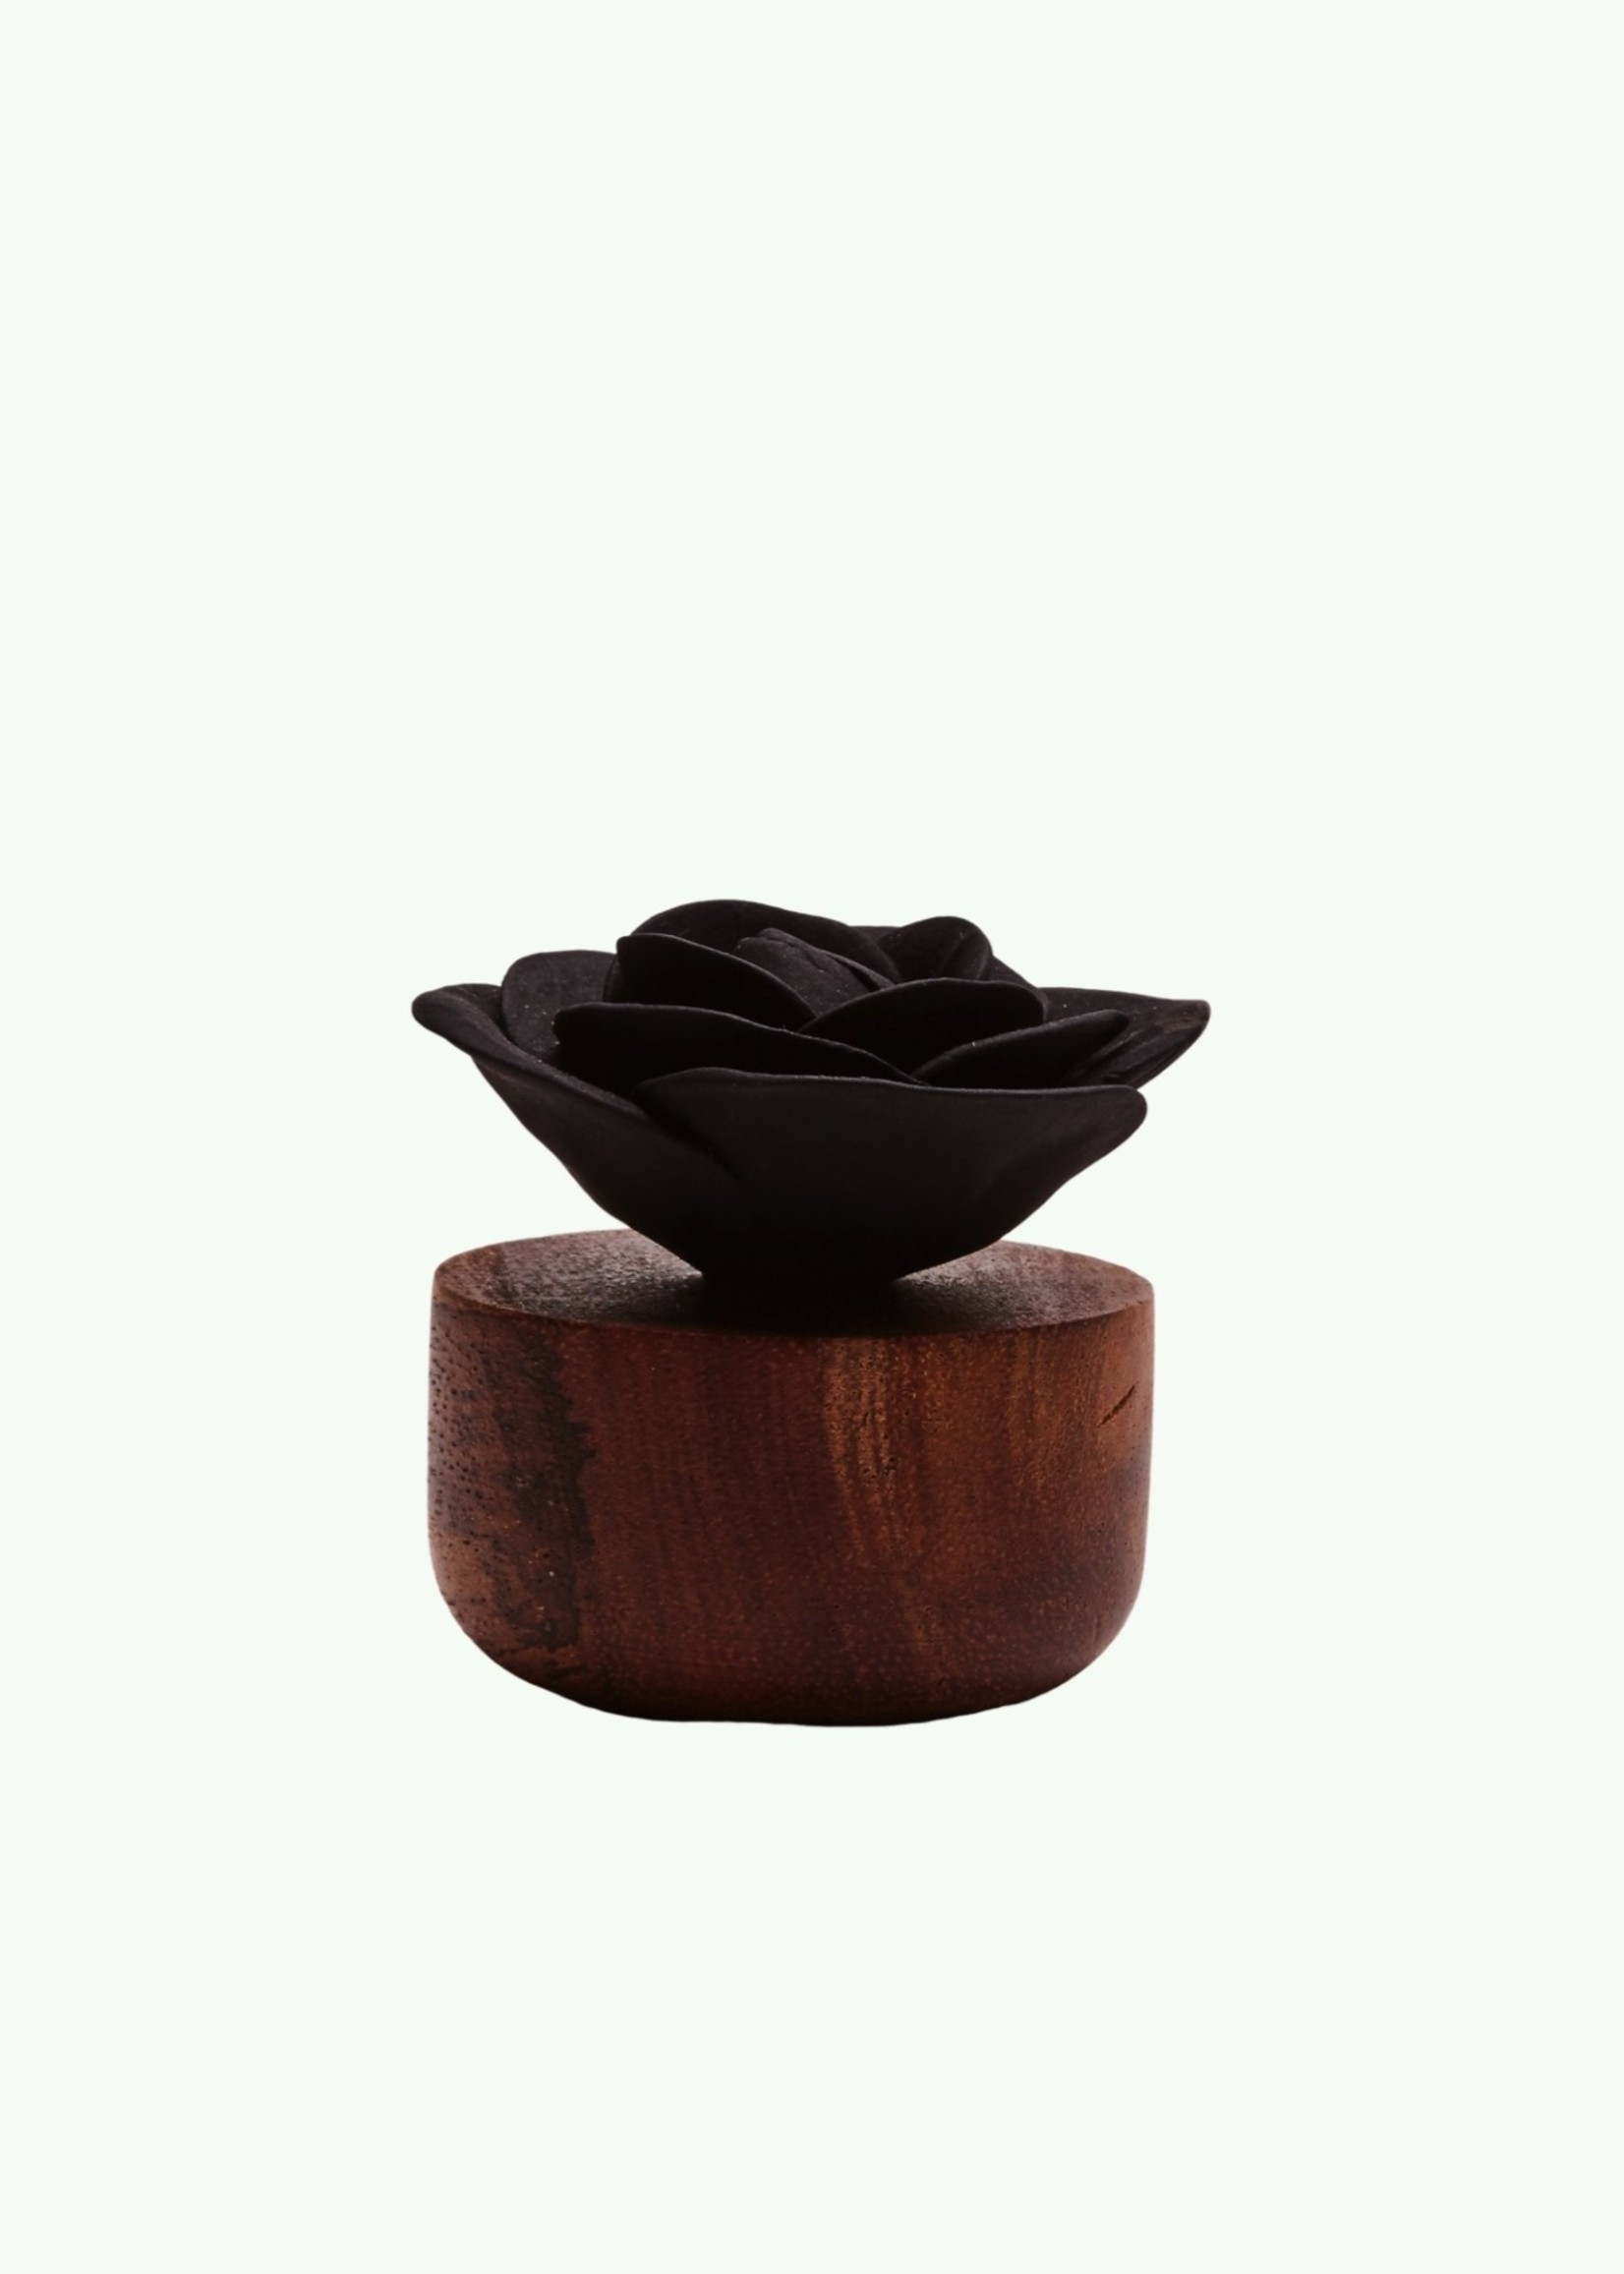 Anoq Anoq - Rose du Bengale - Perfume Diffuser - 2 colours